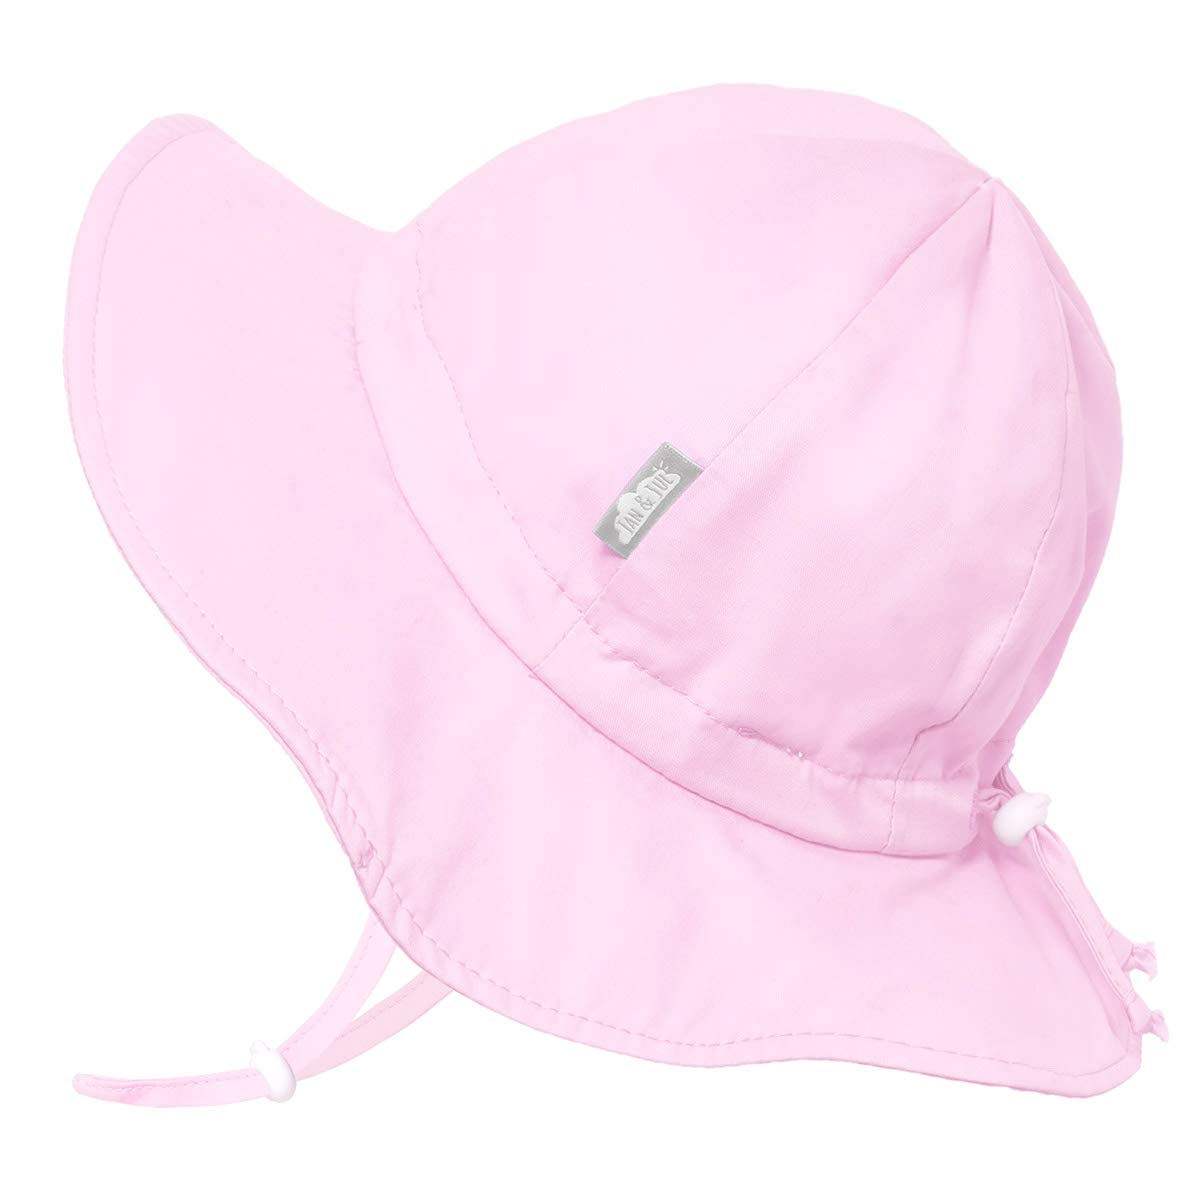 Adjustable Strap Kids Jan /& Jul Girls Wide Brim UV Protection Cotton Sun-Hat Toddler for Baby